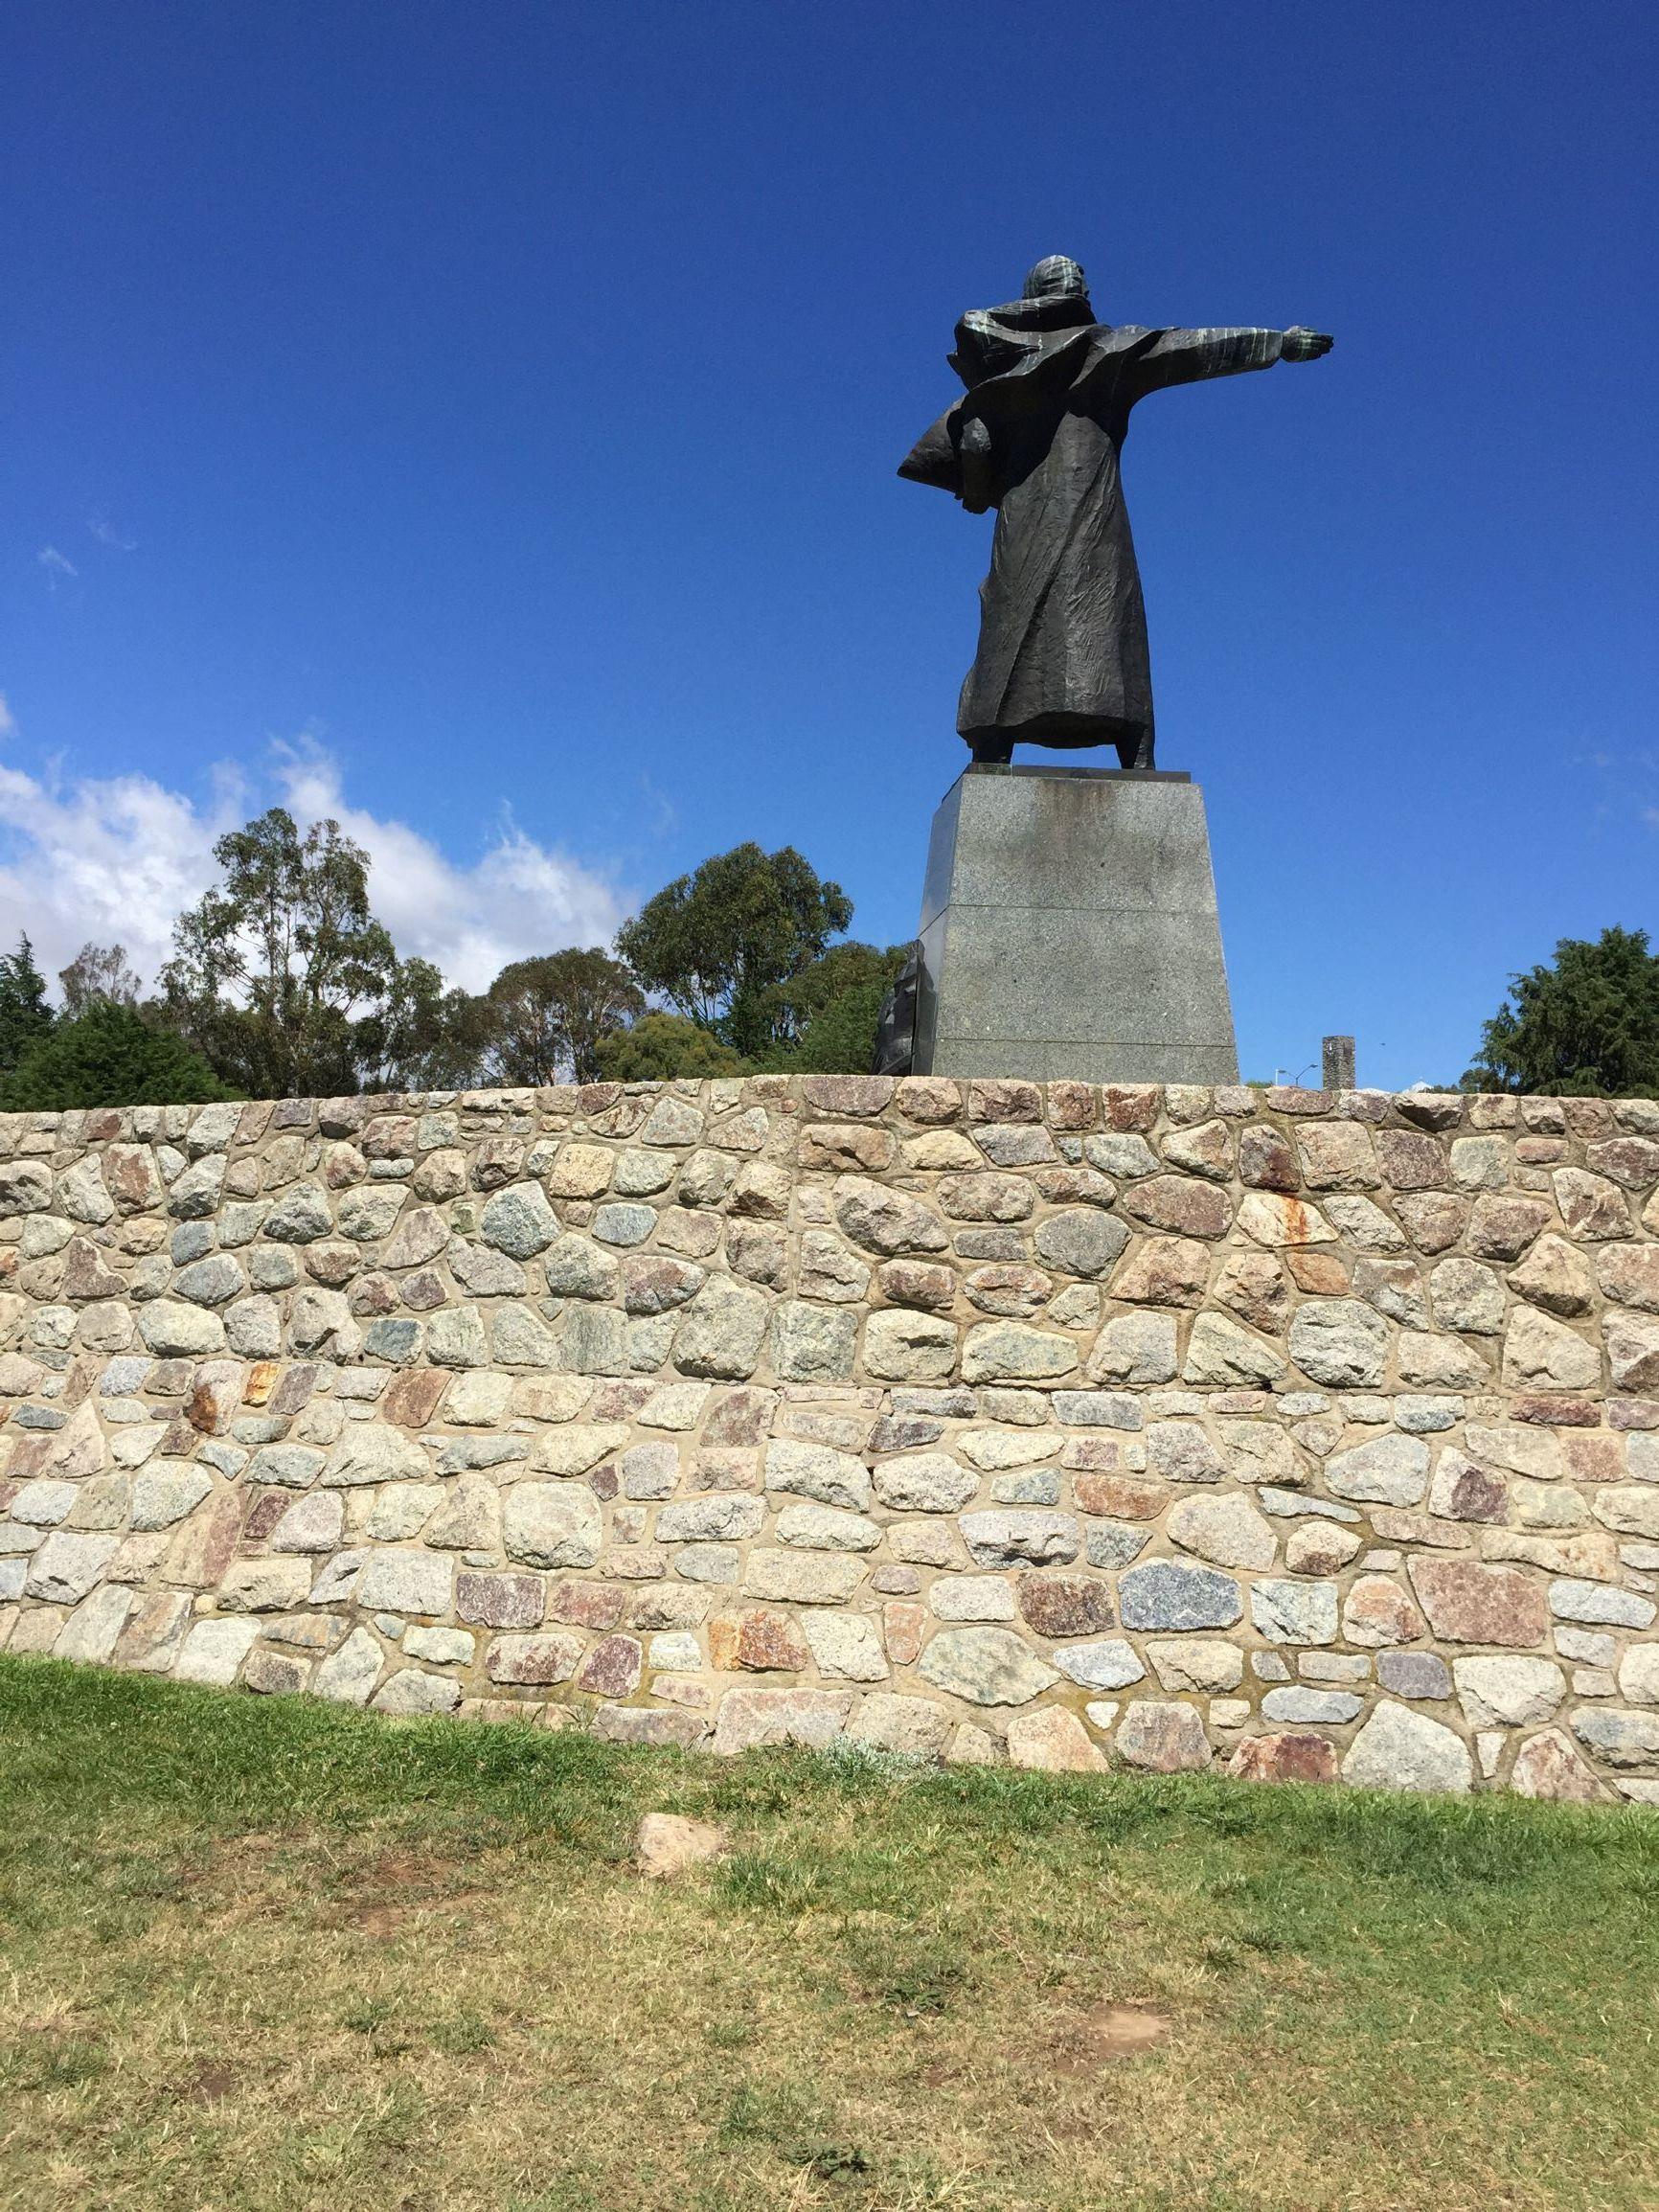 Bossy statue